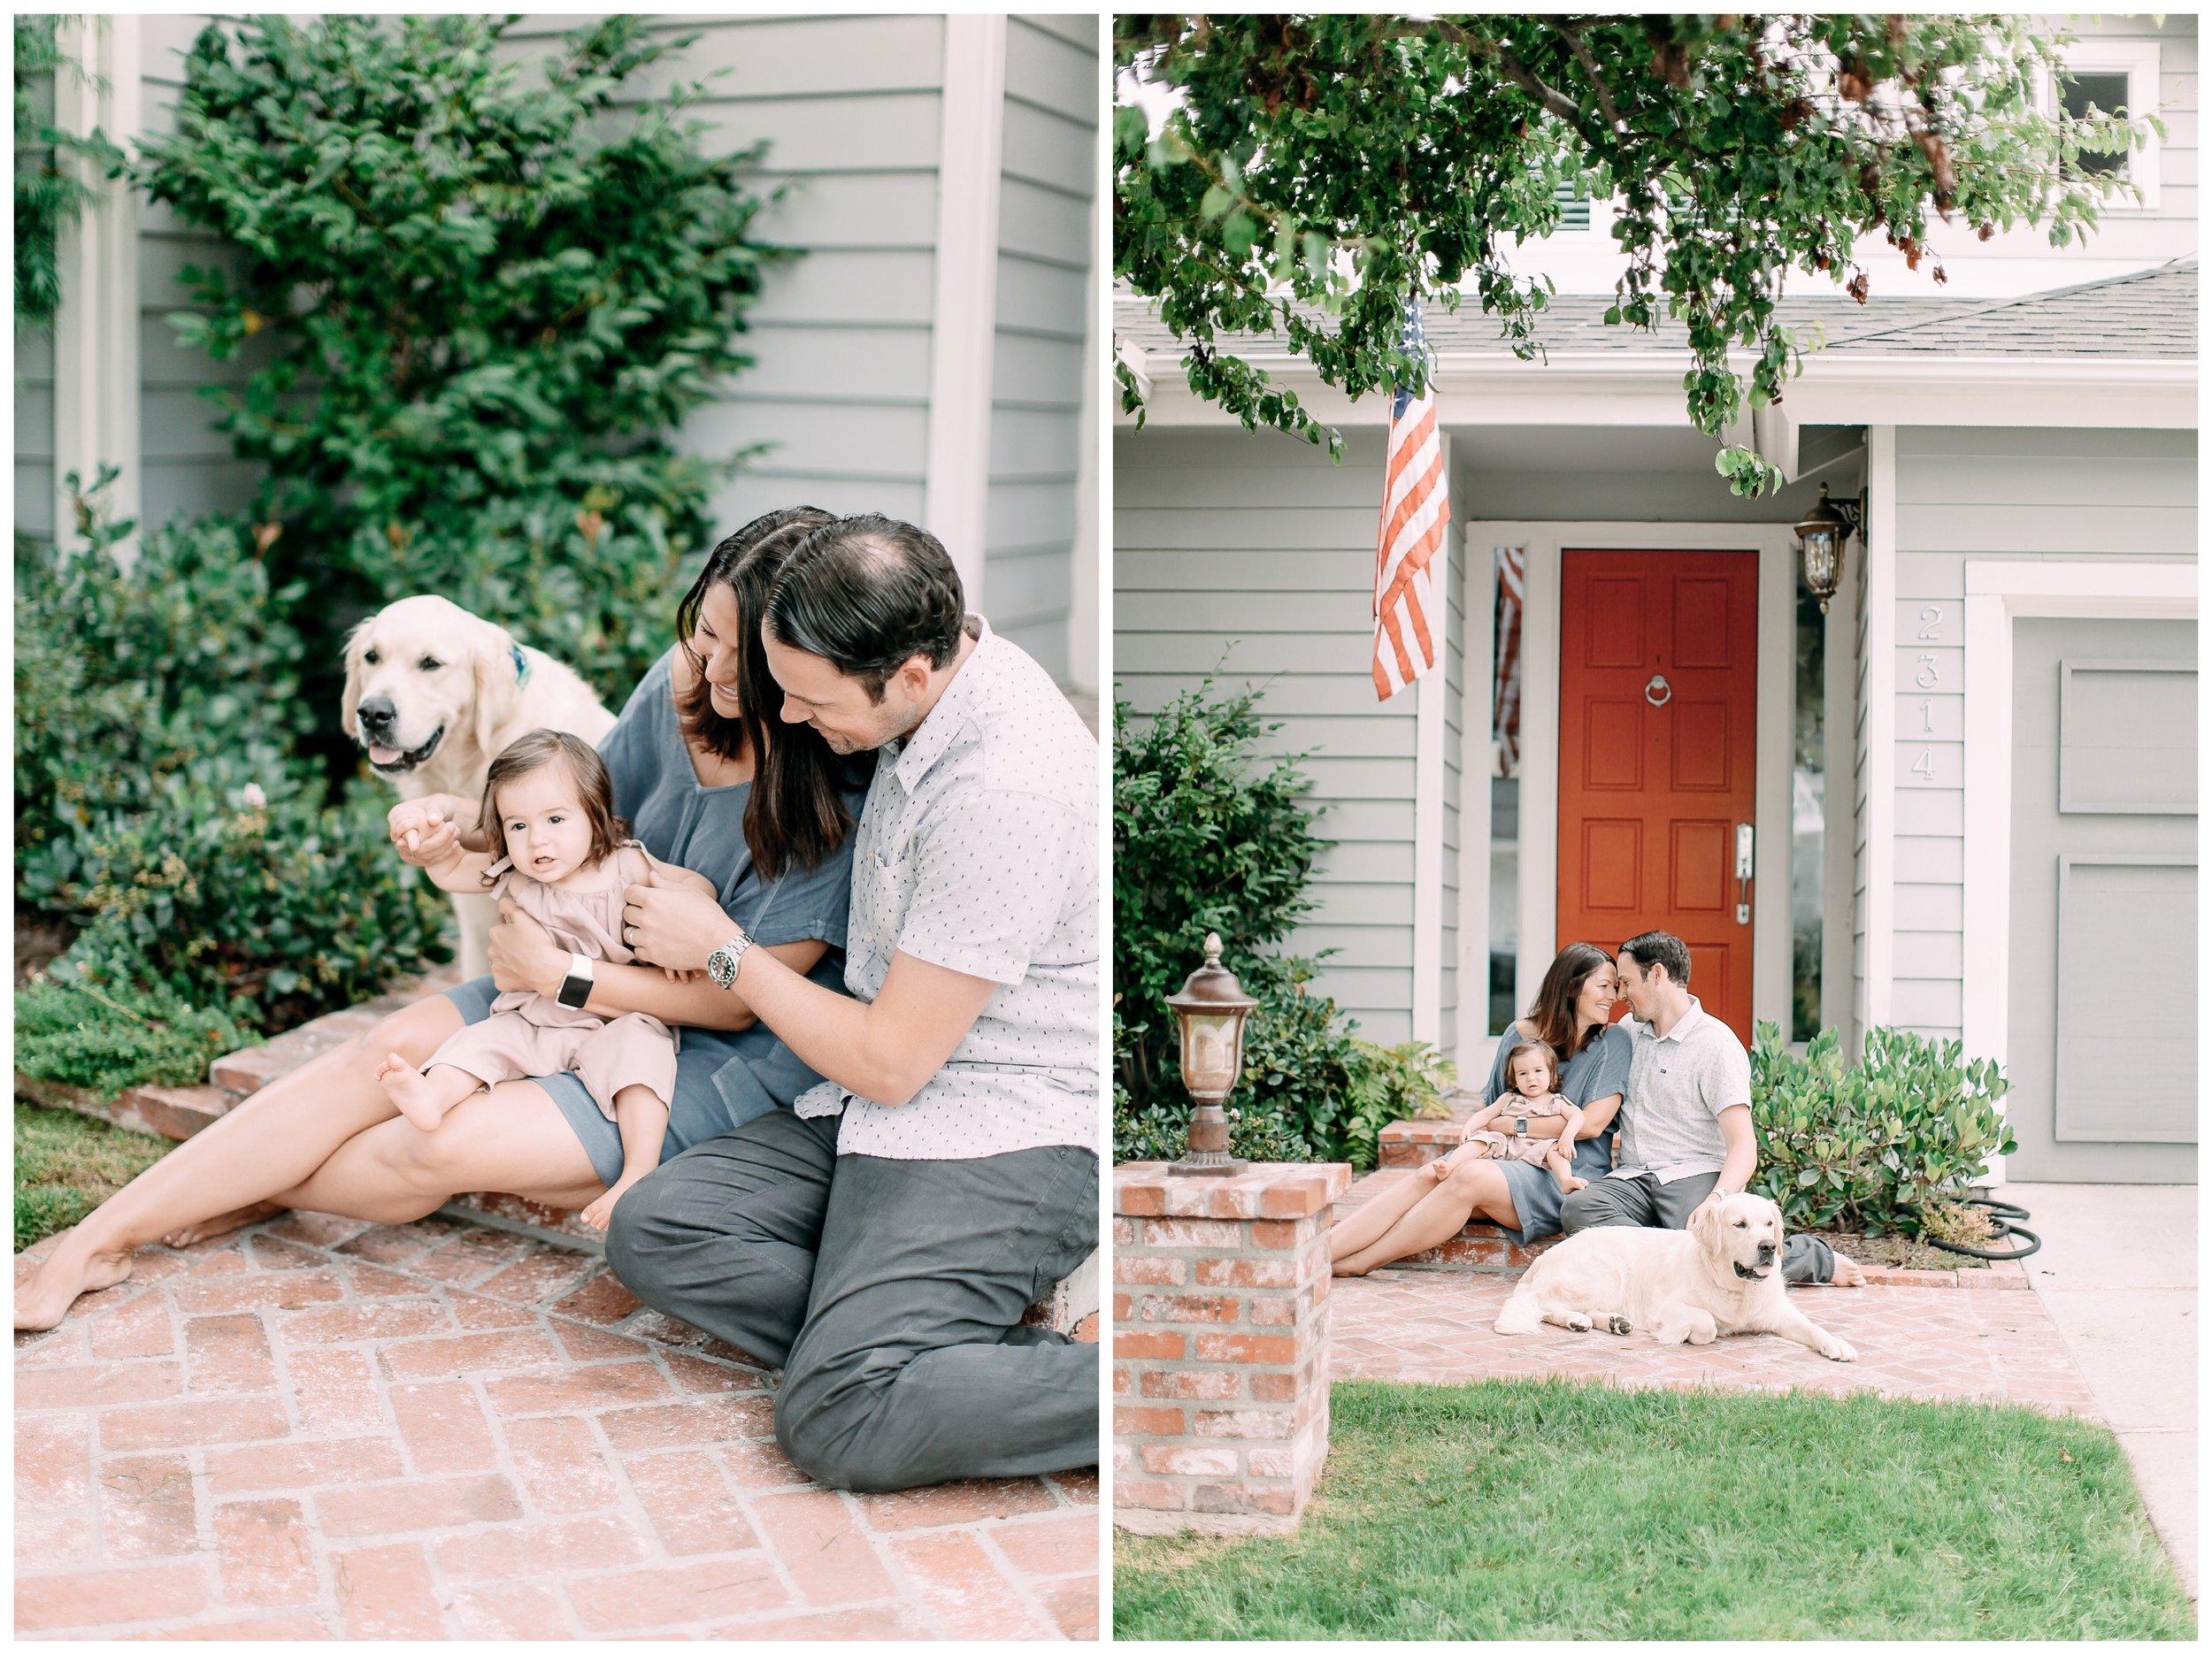 Orange_county_family_photographer_cori_kleckner_photography_0415.jpg